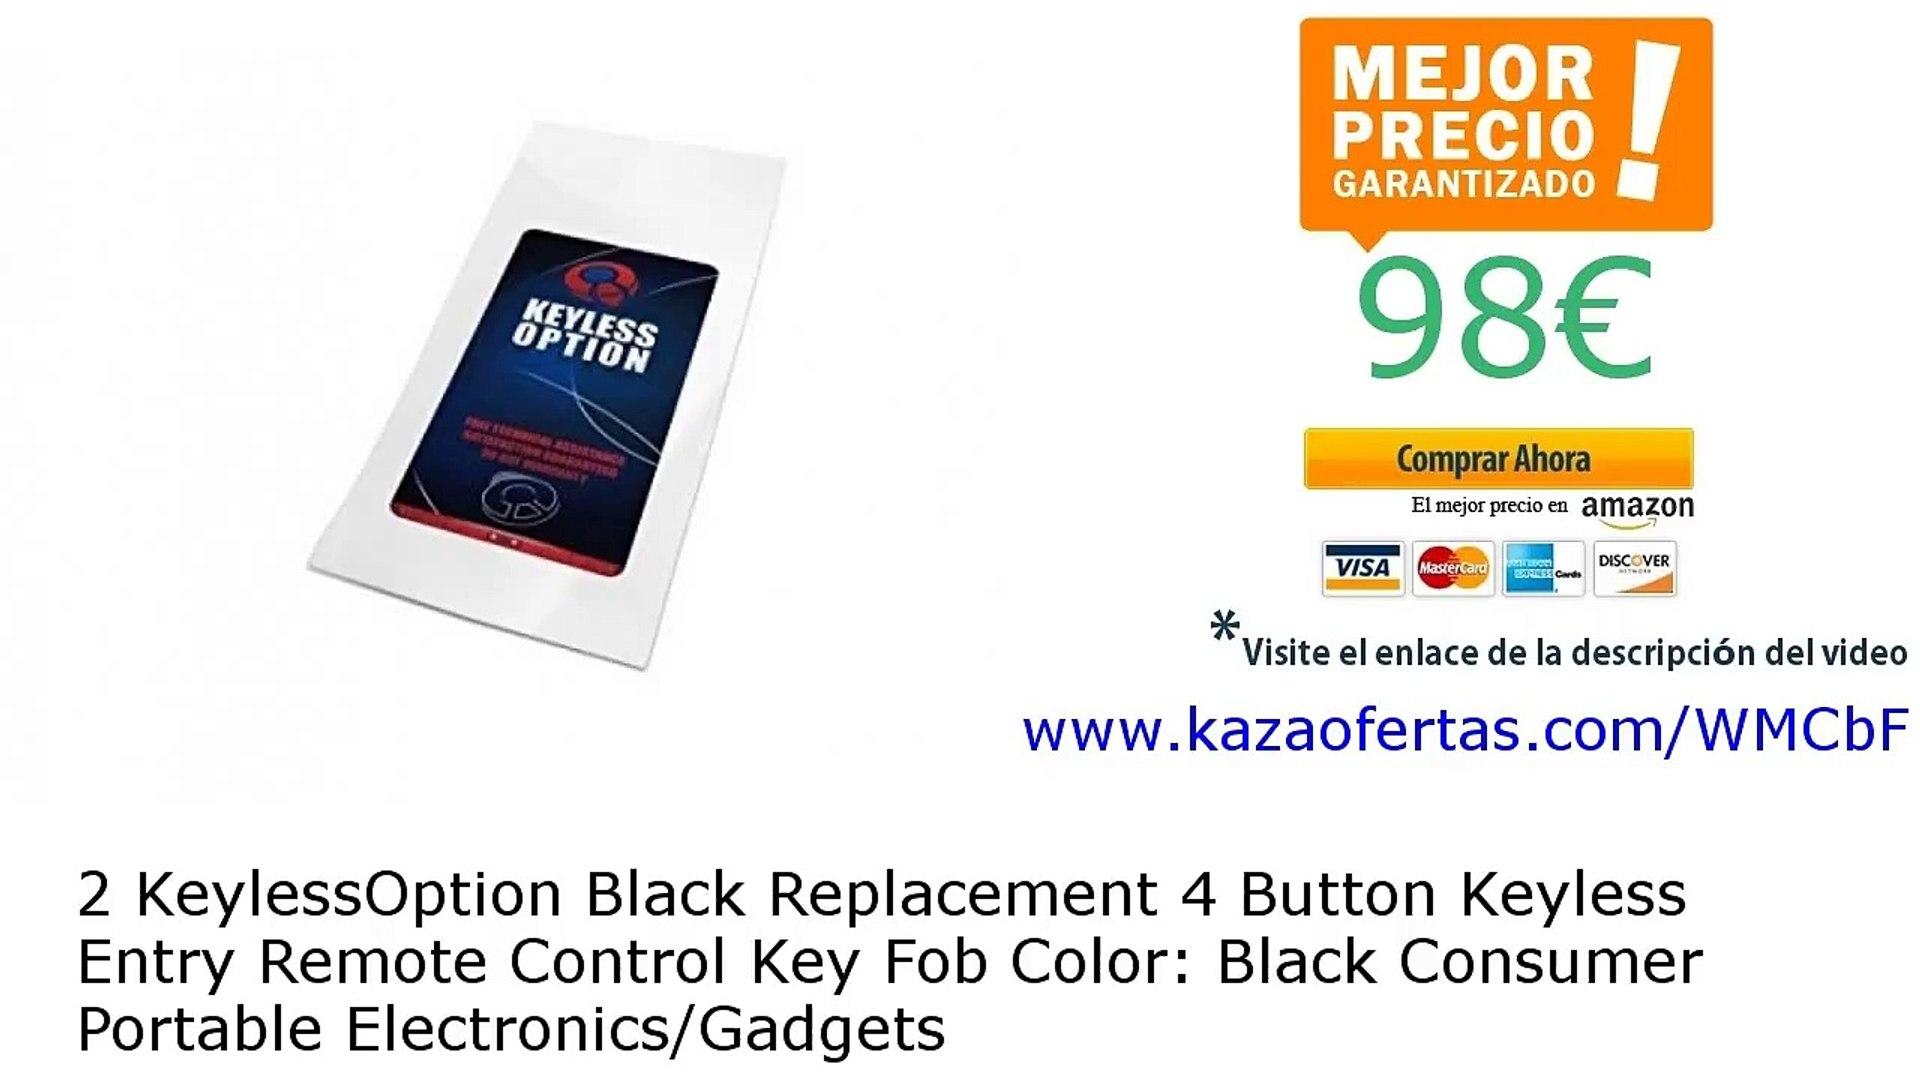 KeylessOption Replacement 4 Button Keyless Entry Remote Control Key Fob